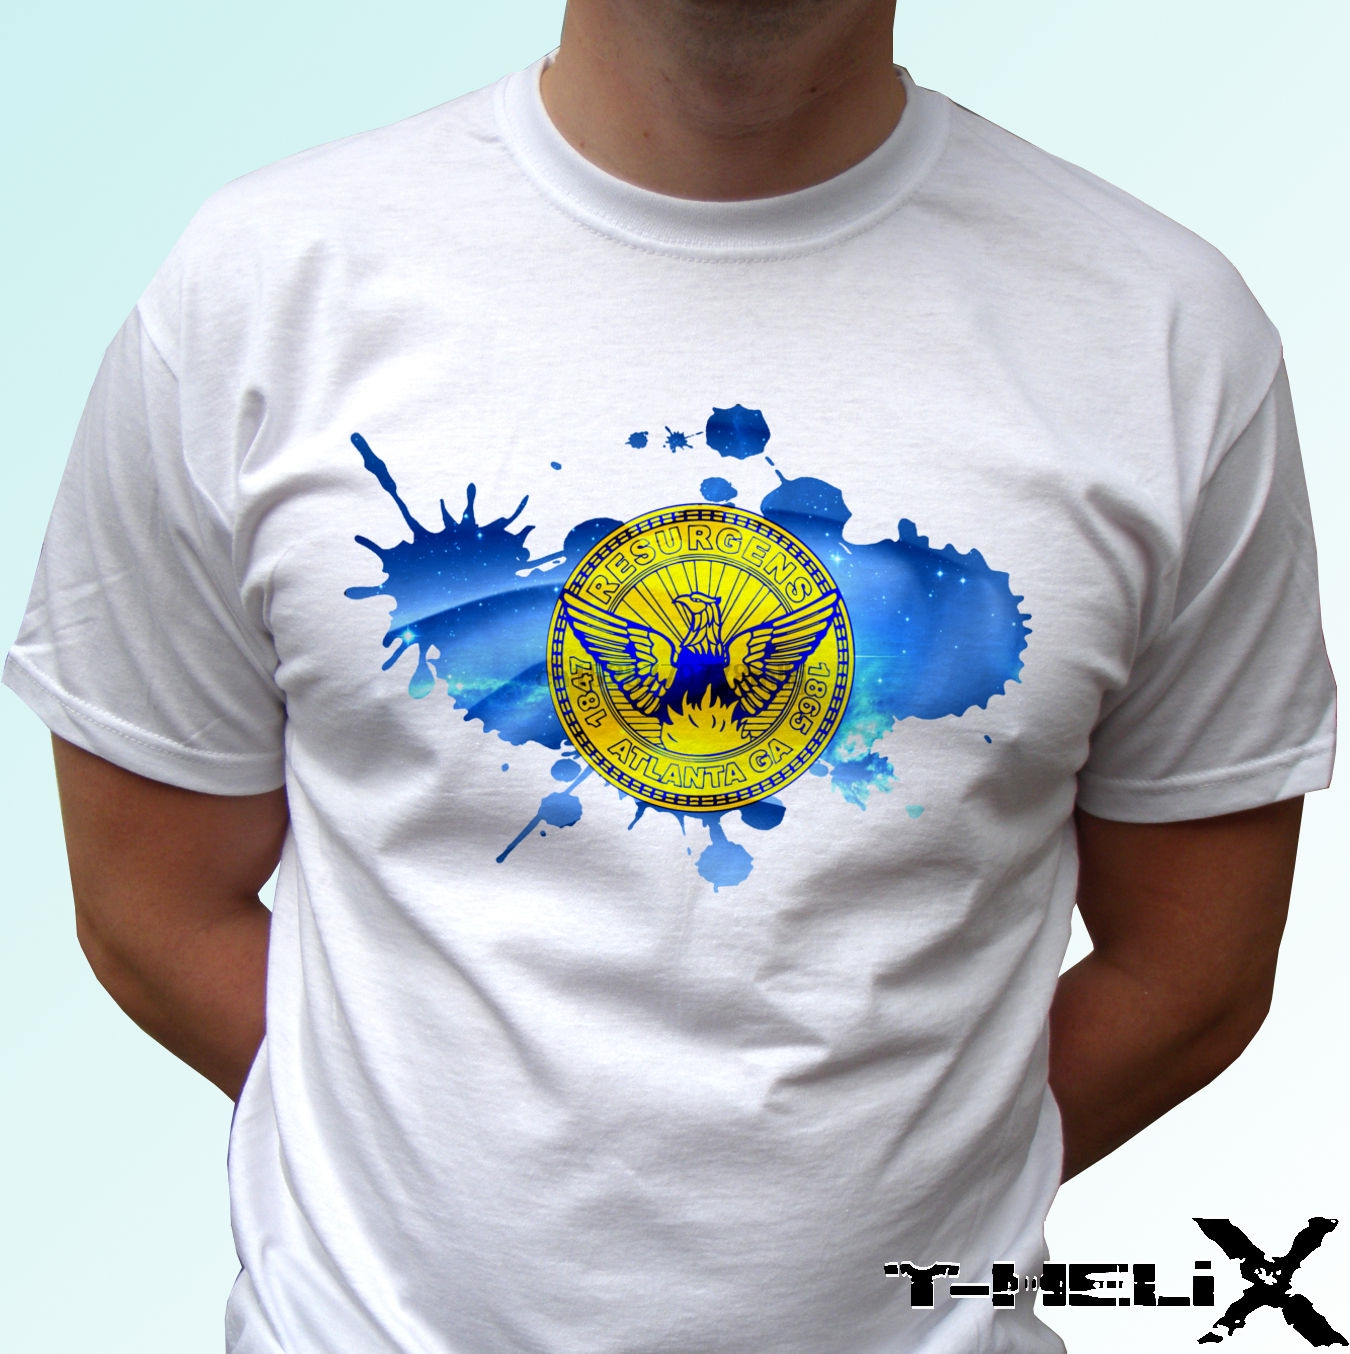 100% Cotton 100% Cotton Print Mens Summer O-Neck Atlanta City Flag - White T Shirt Top Usa Design - Menst Shirt Design Template